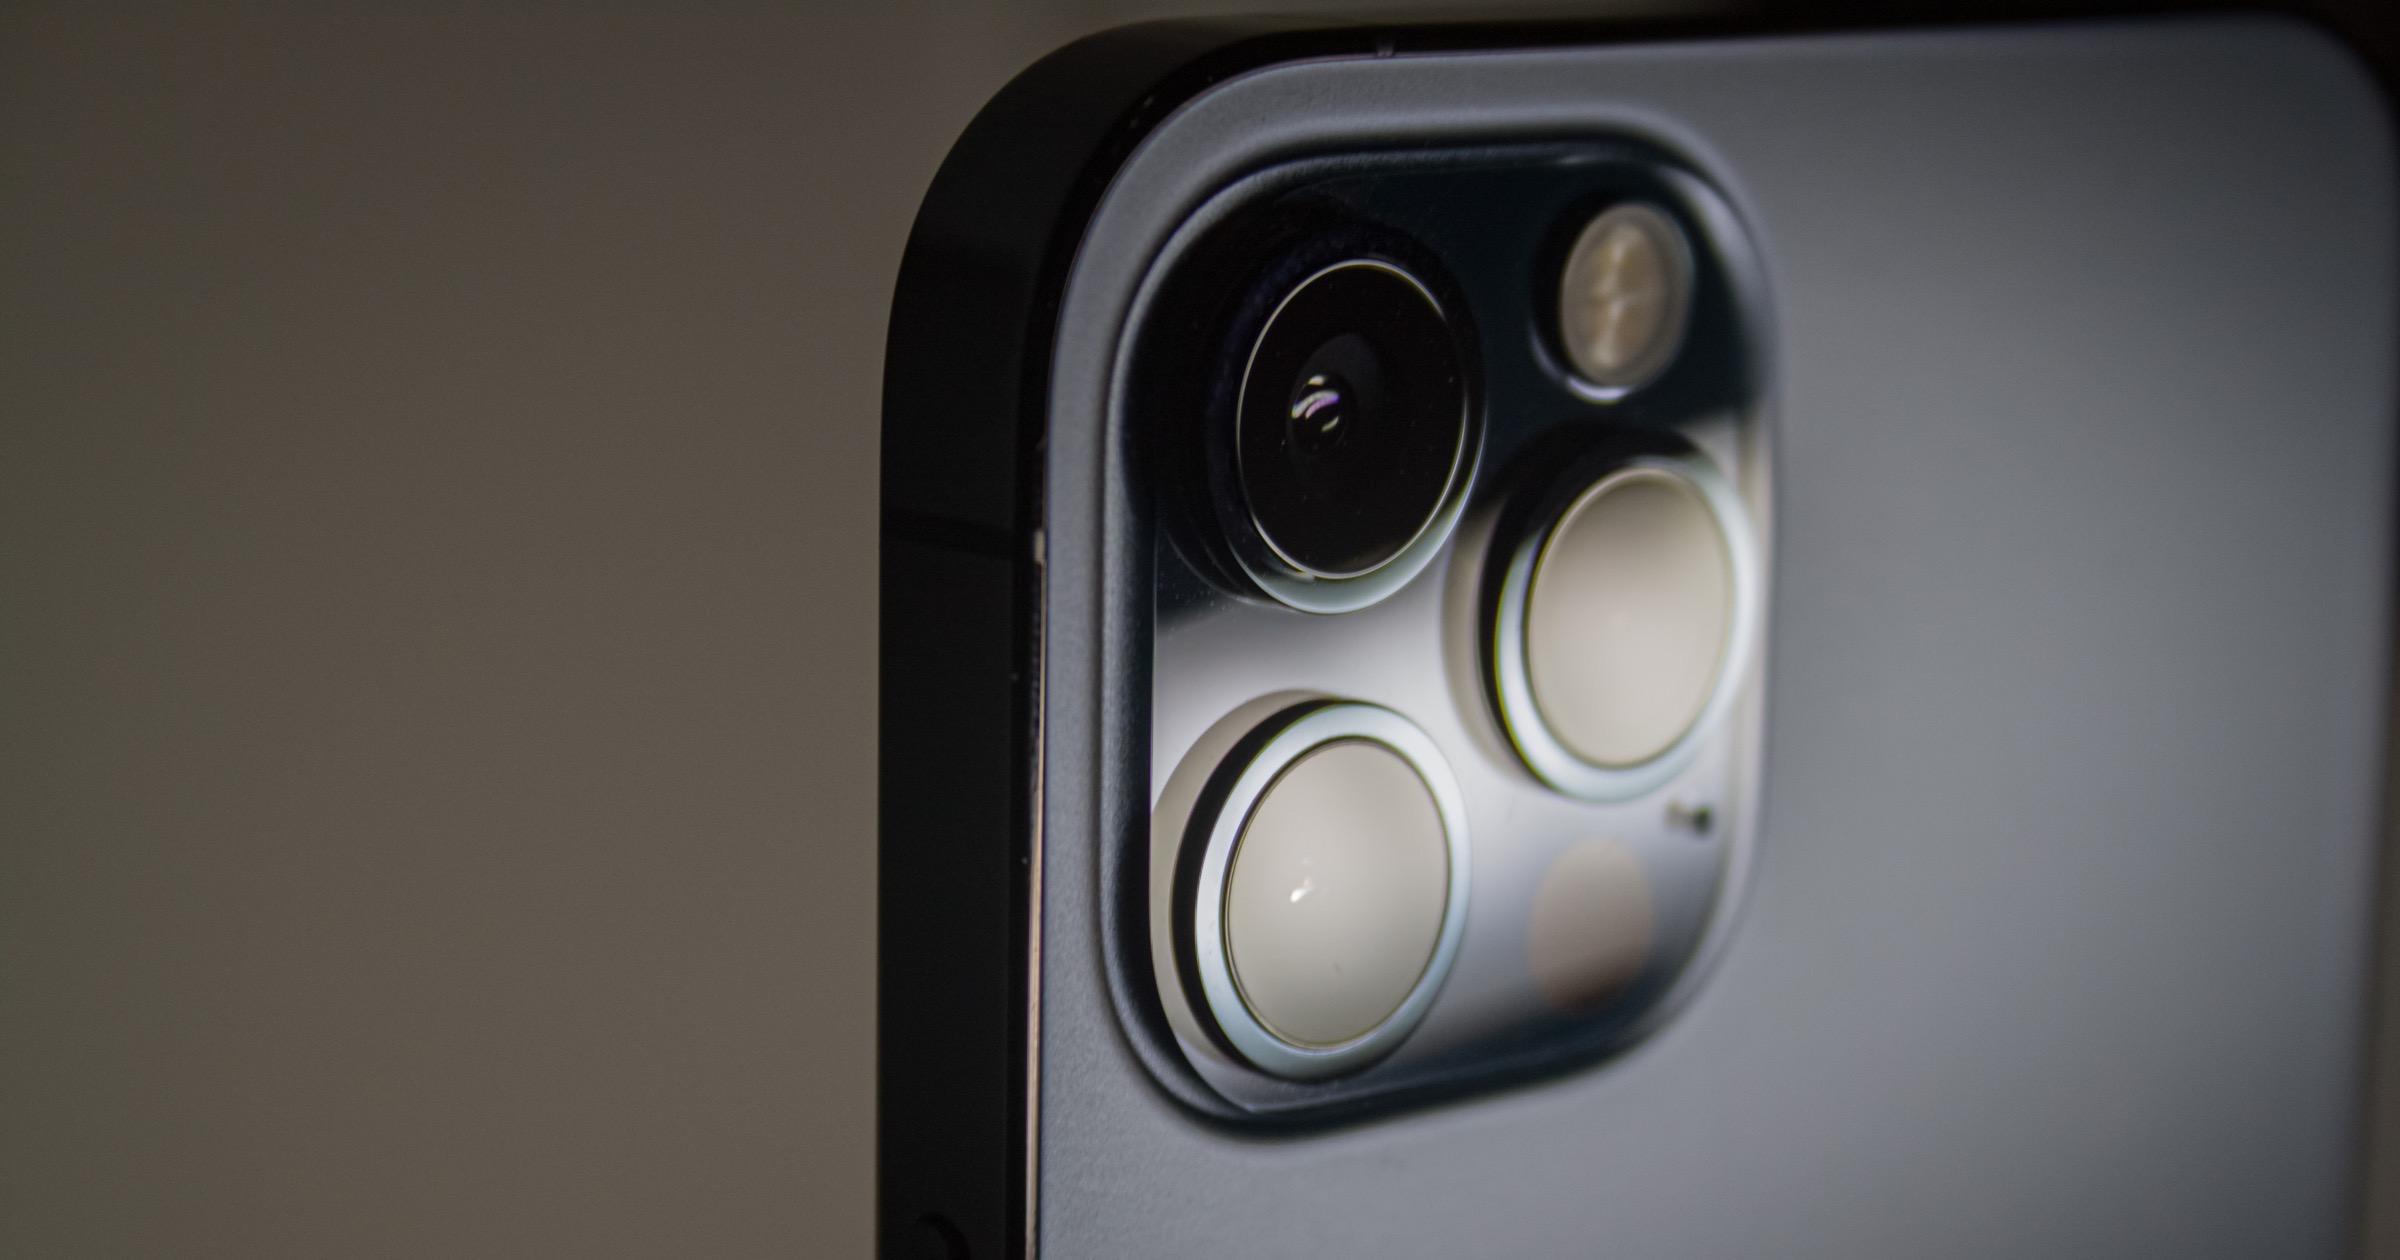 Closeup of the iPhone 12 Pro camera.